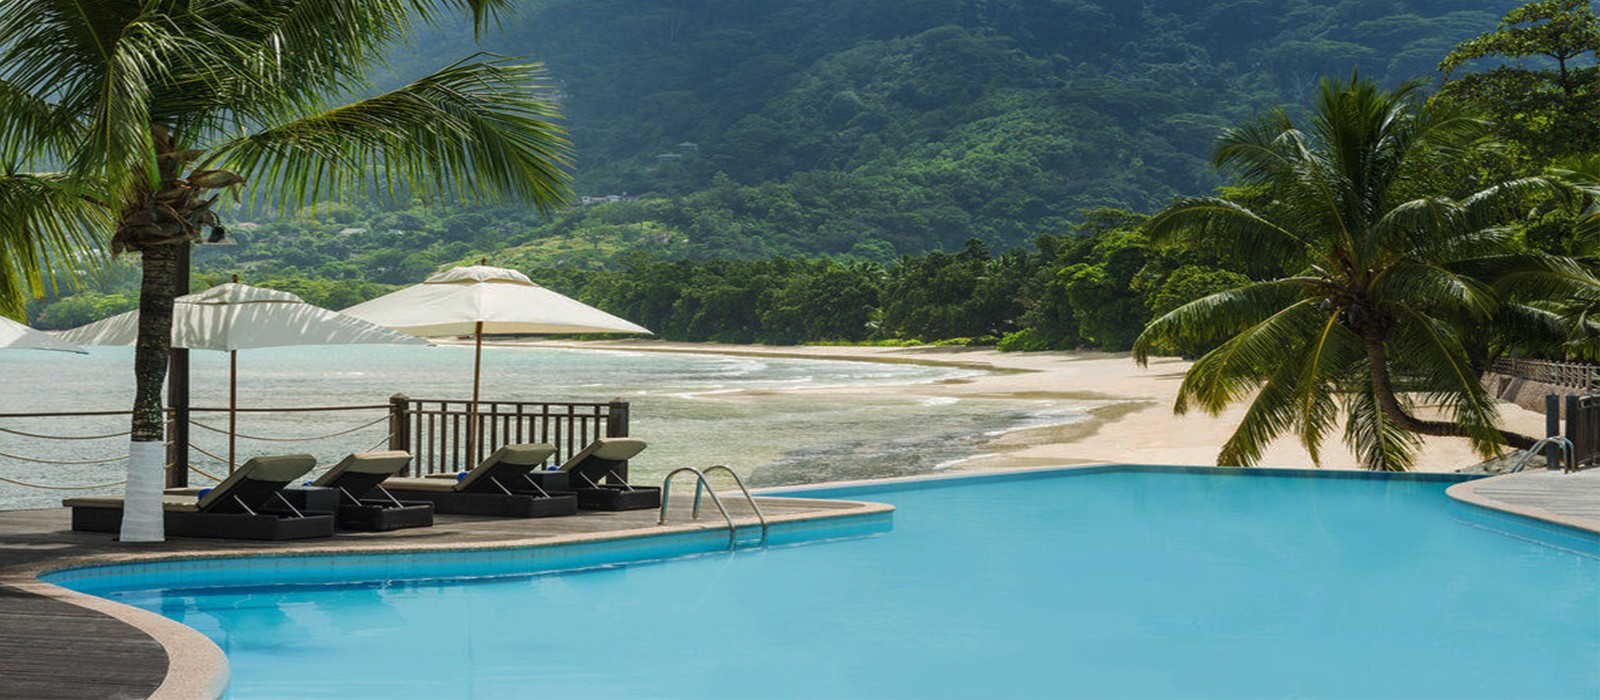 Le Meridien Fisherman's Cove - Luxury Seychelles Holiday Packages - header